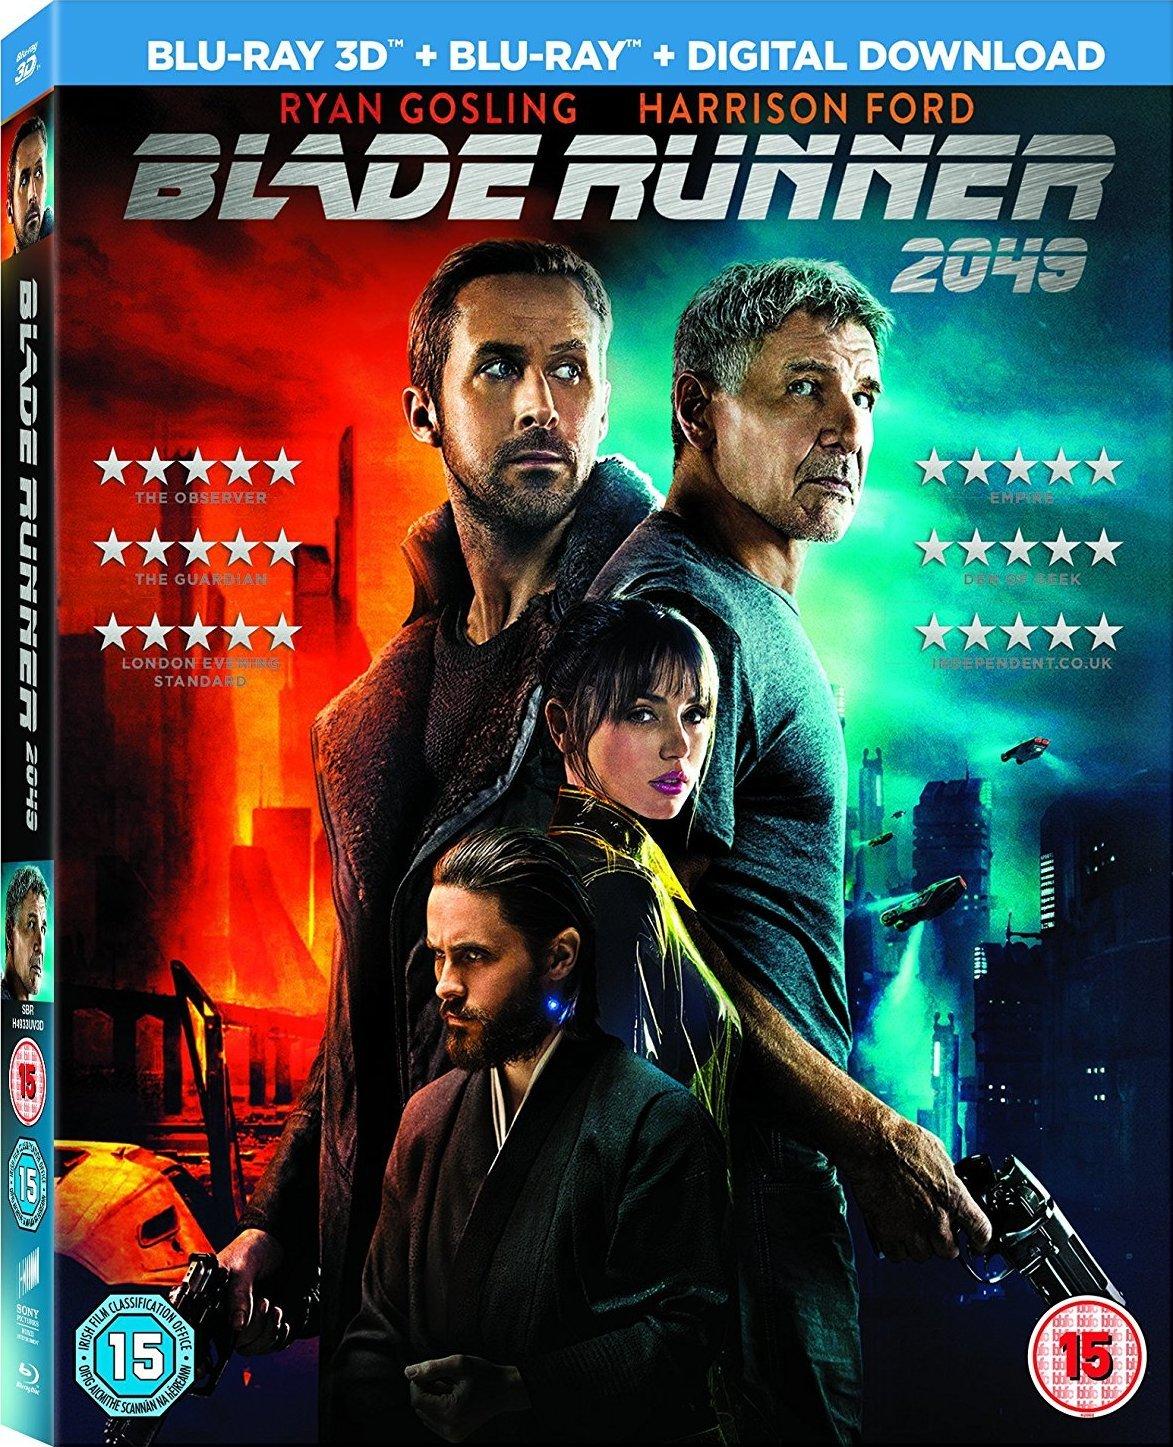 Blade Runner 2049 Blu Ray 3d Blu Ray Harrison Ford Ryan Gosling Denis Villeneuve Ridley Scott Movies Tv